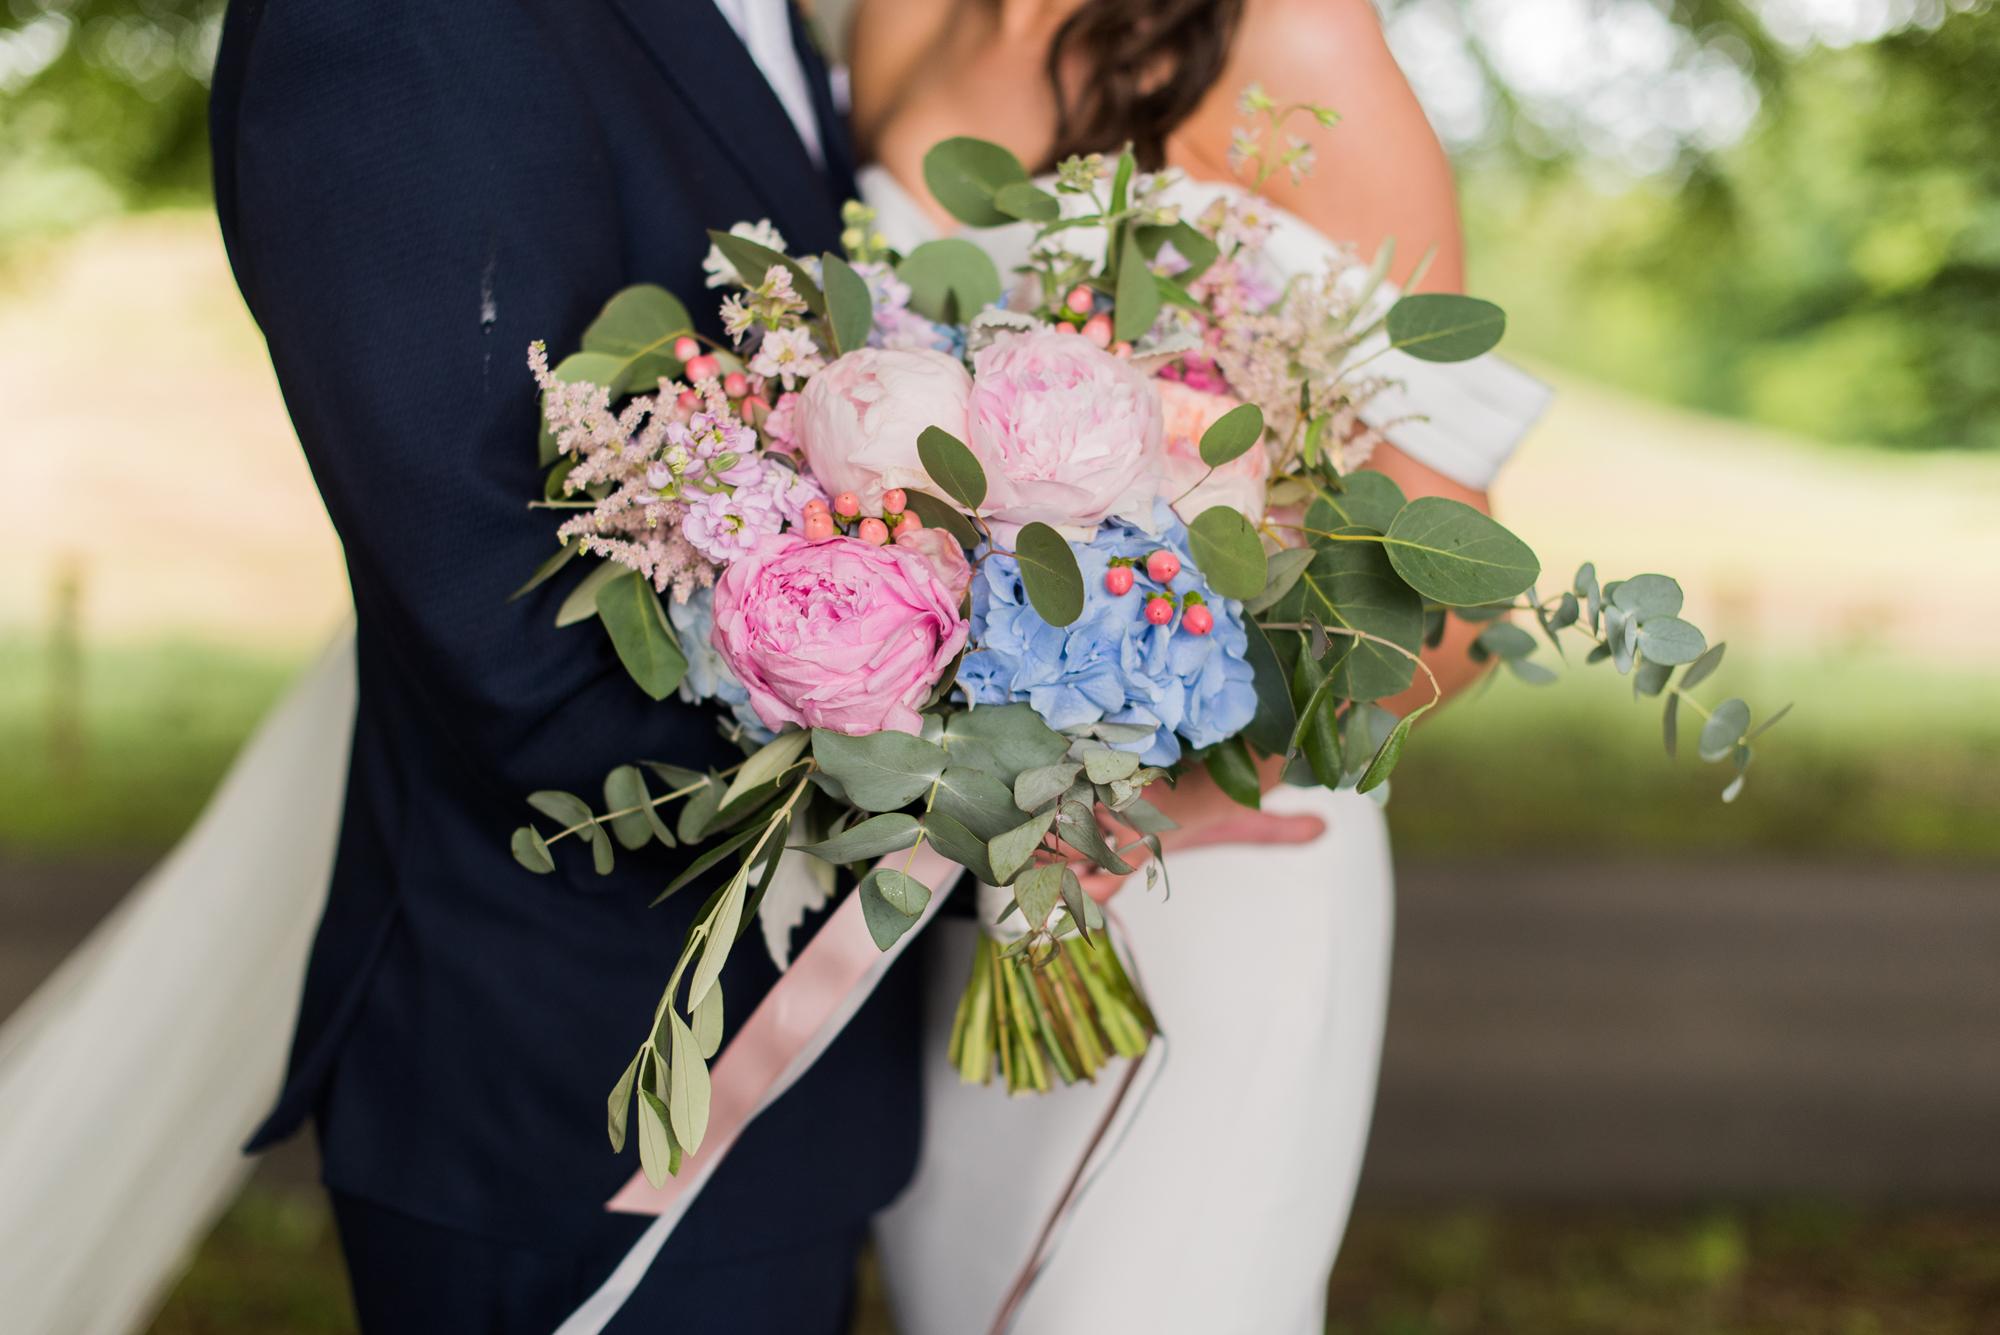 mark_barton_Wedding_photographer_northern_ireland_13.jpg